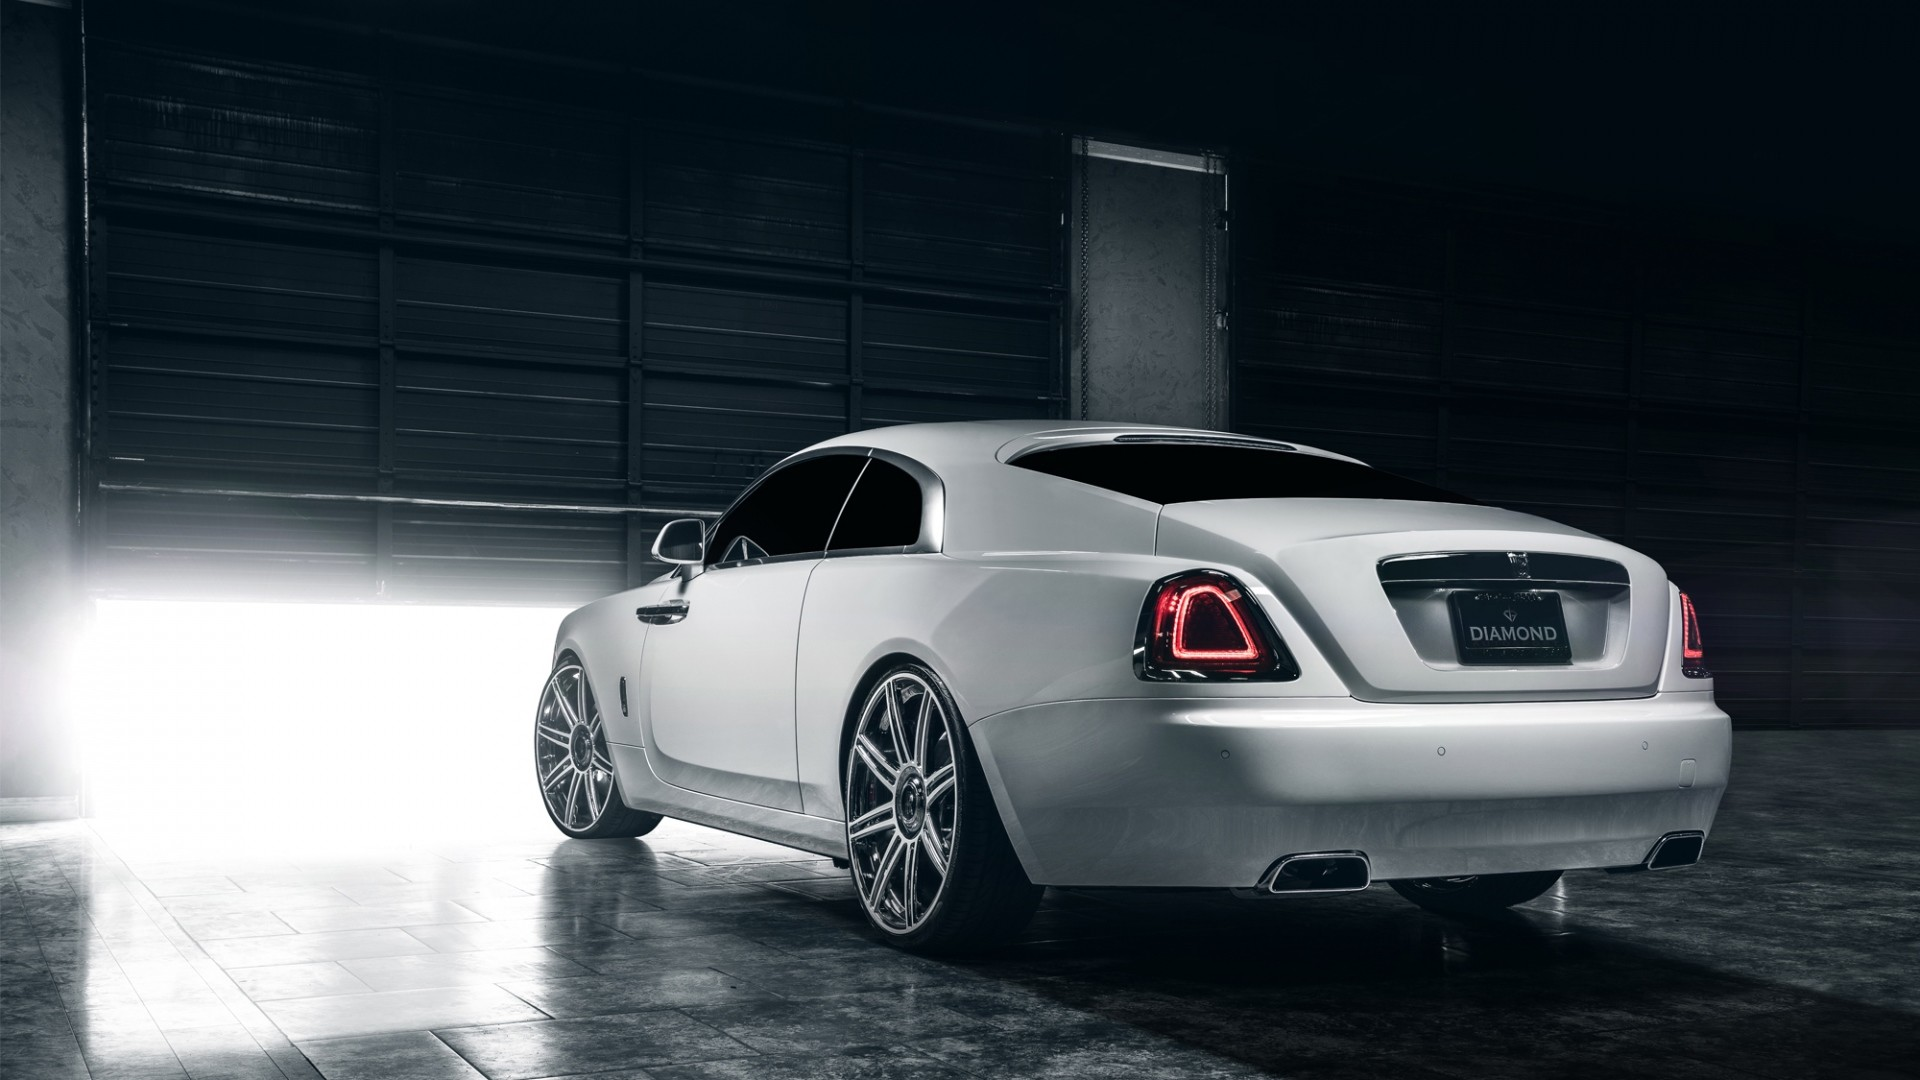 Rolls Royce Wallpapers (63+ pictures)